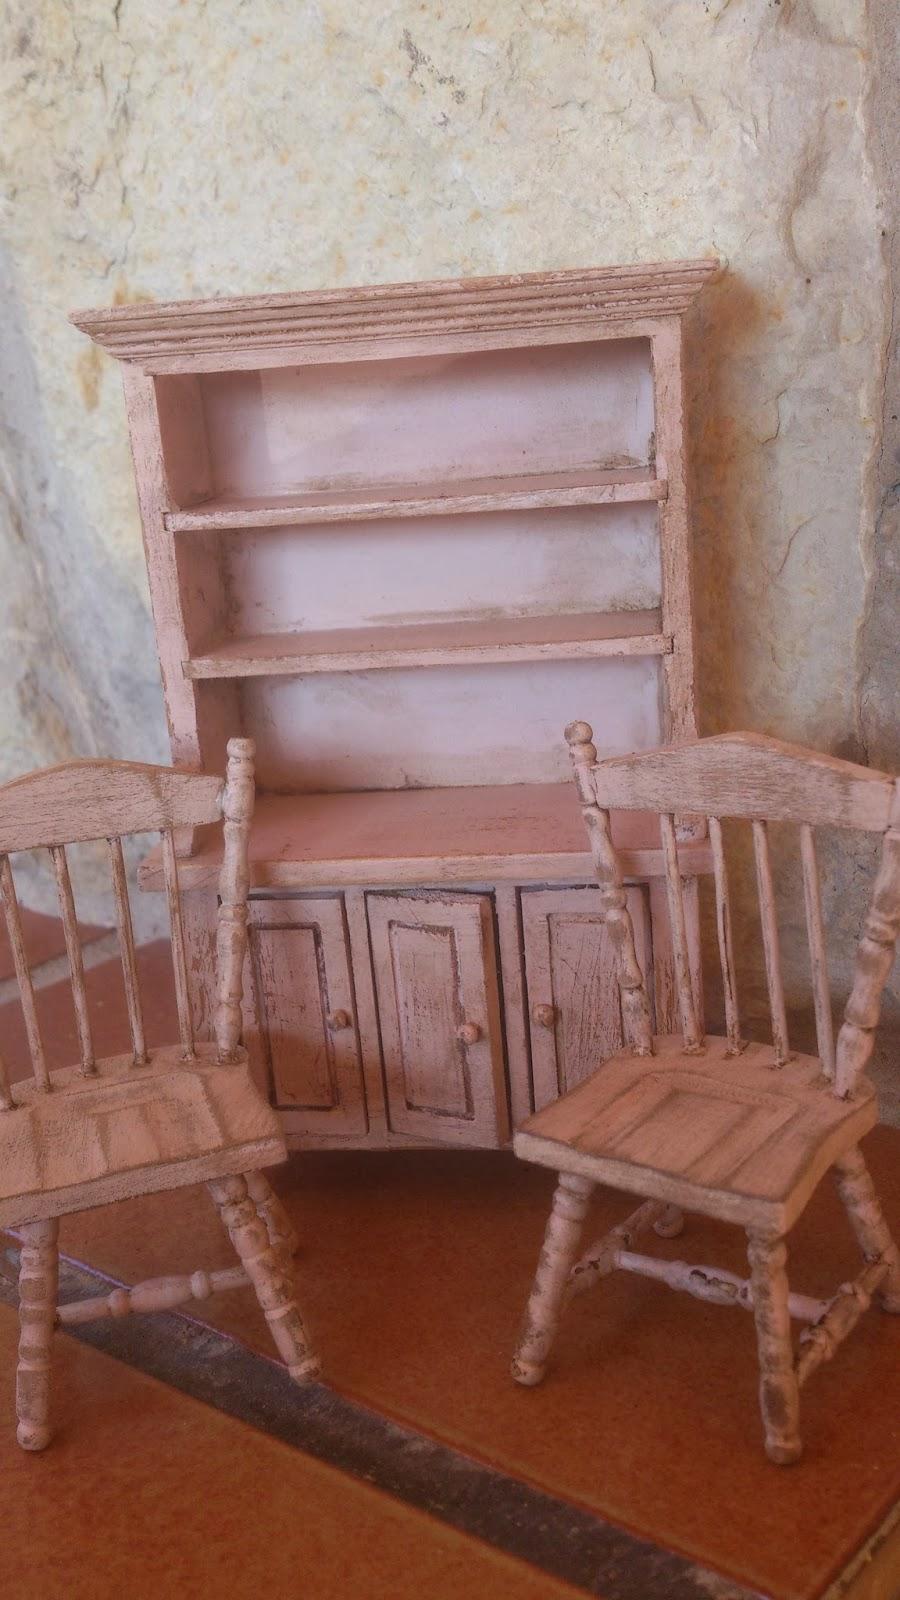 La Rustica Muebles Dise Os Arquitect Nicos Mimasku Com # Muebles Sarchi Guapiles